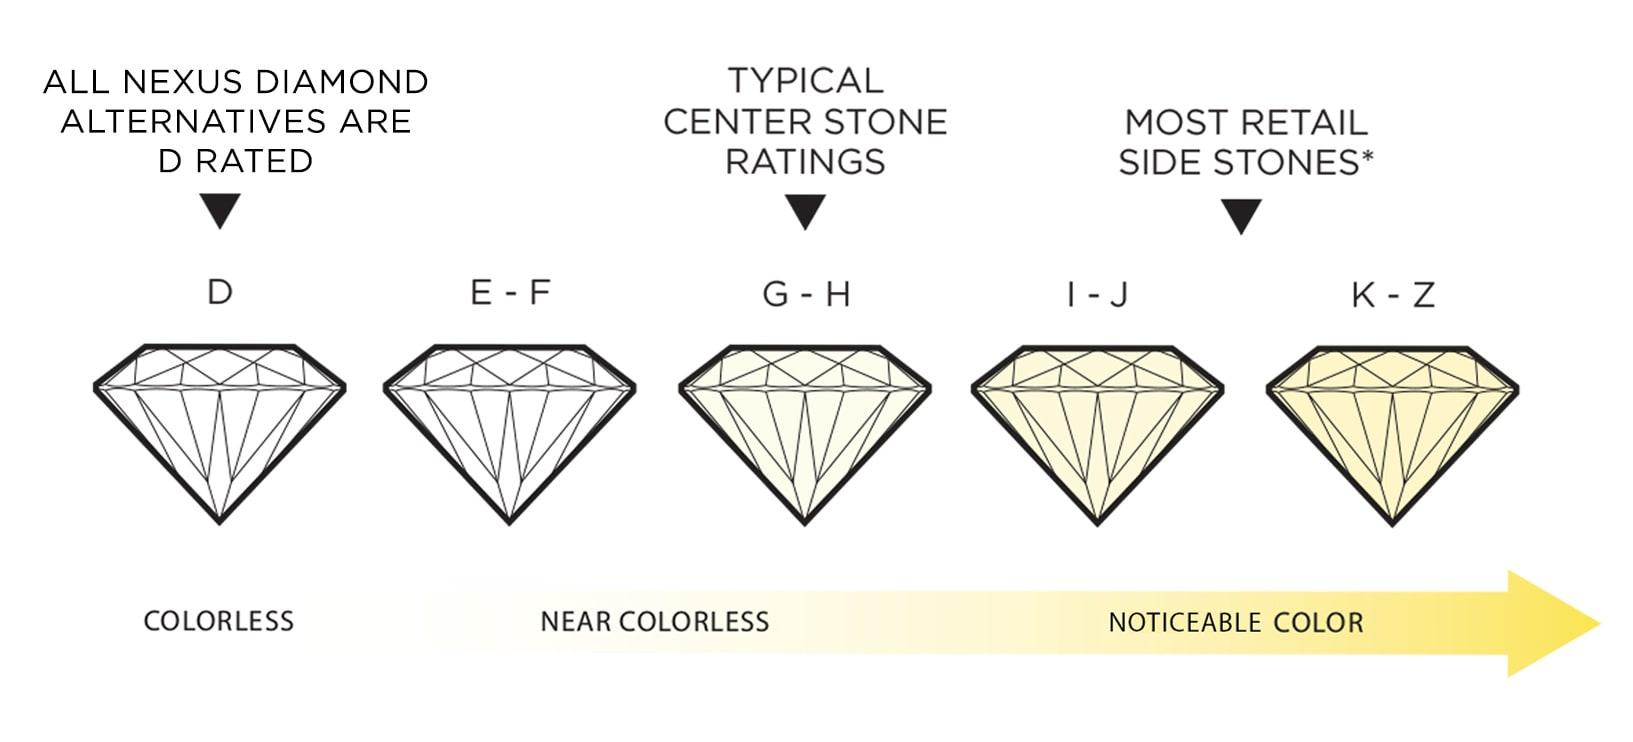 Nexus Diamond stones in comparison to most retail stones